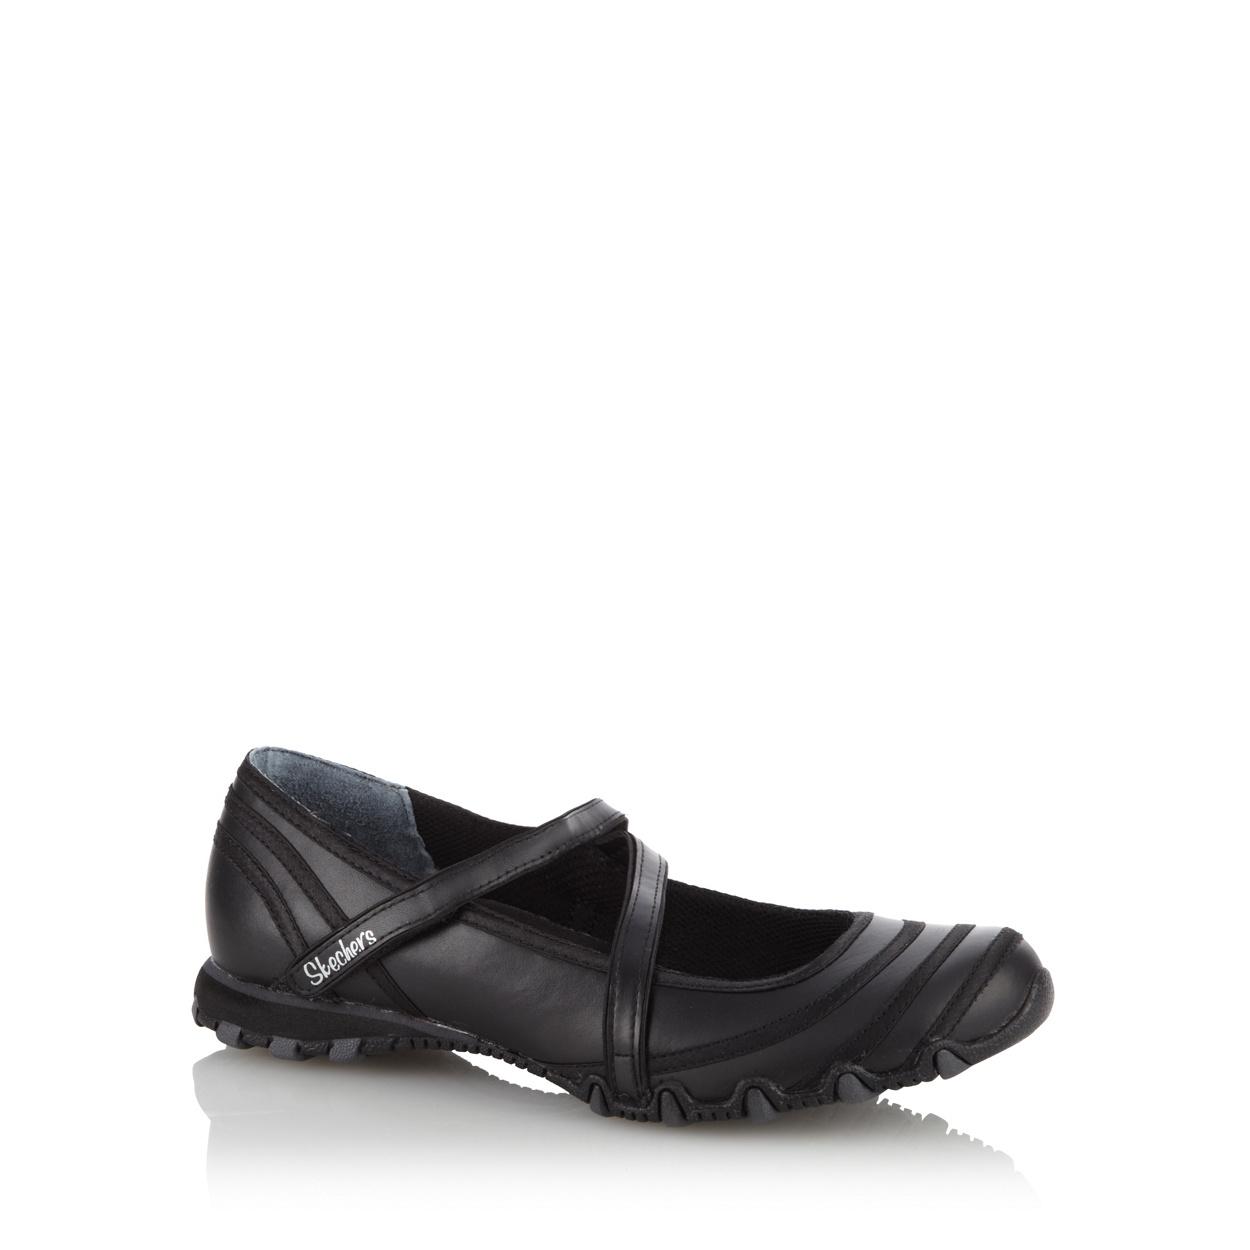 Black sandals debenhams -  Jimmy Choo Black Gold Sandals Debenhams Direct